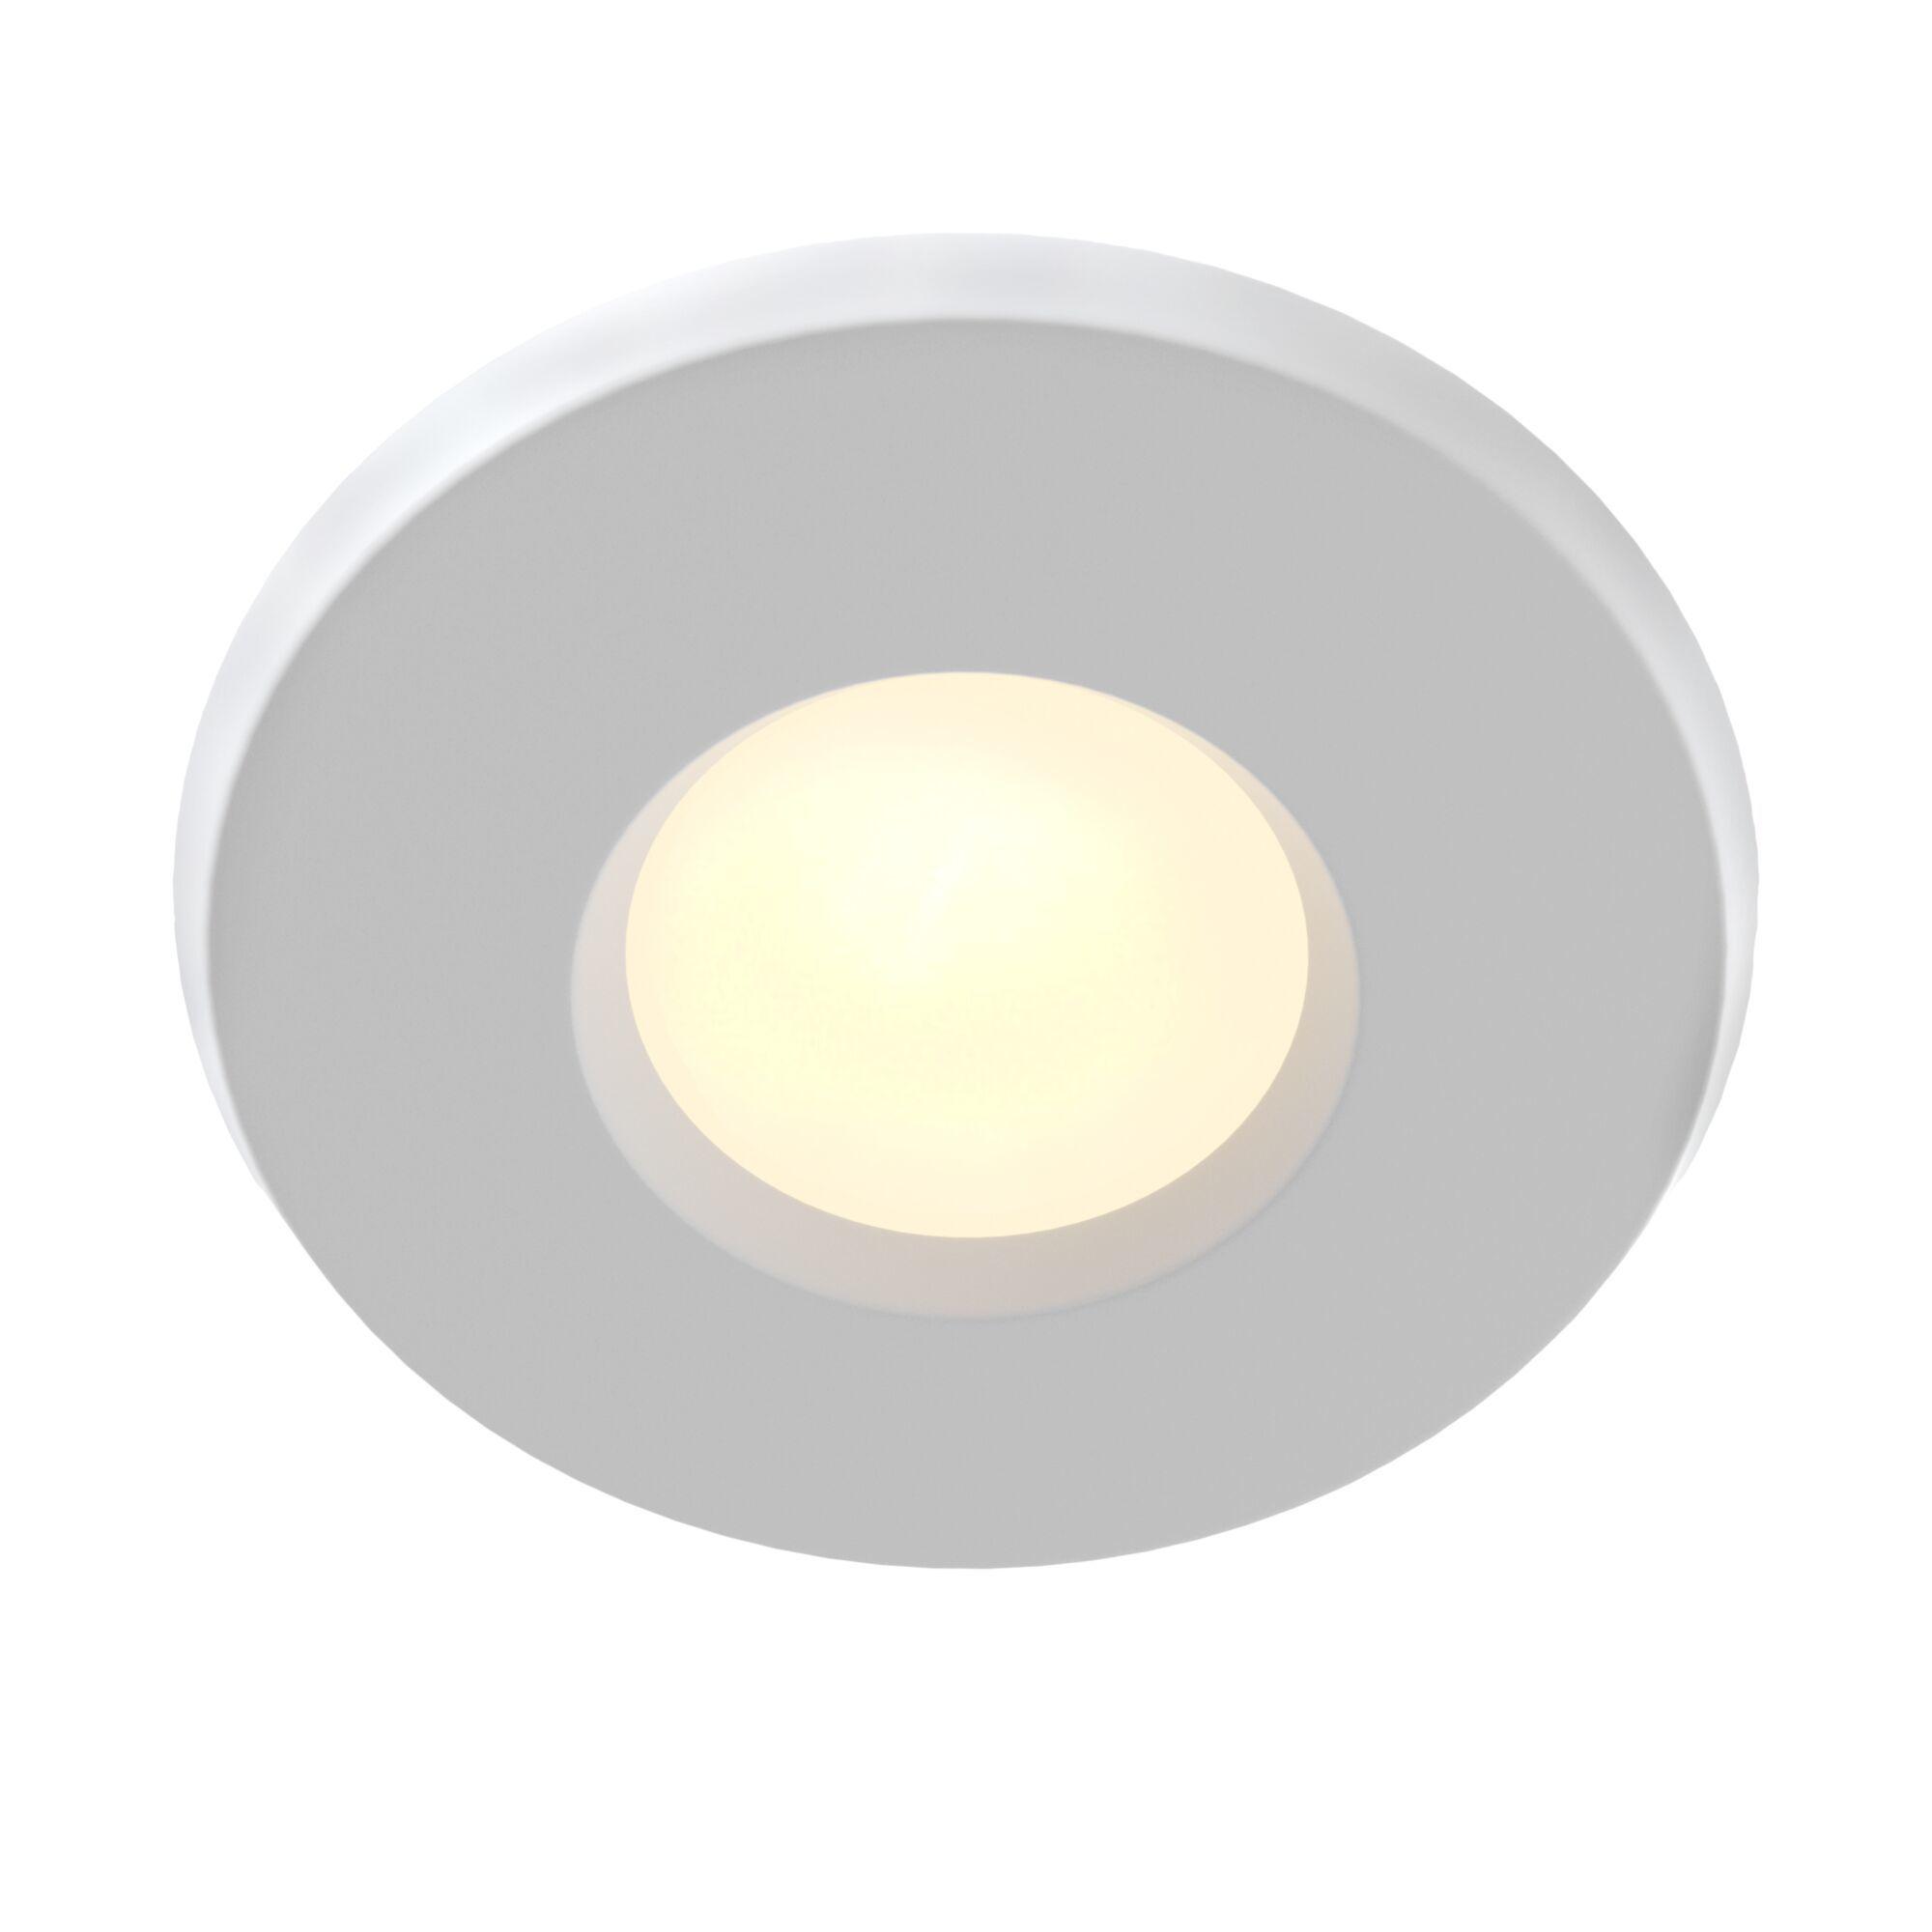 Встраиваемый светильник Maytoni Metal Modern DL010-3-01-W, 1xGU10x50W, белый, металл, стекло - фото 1